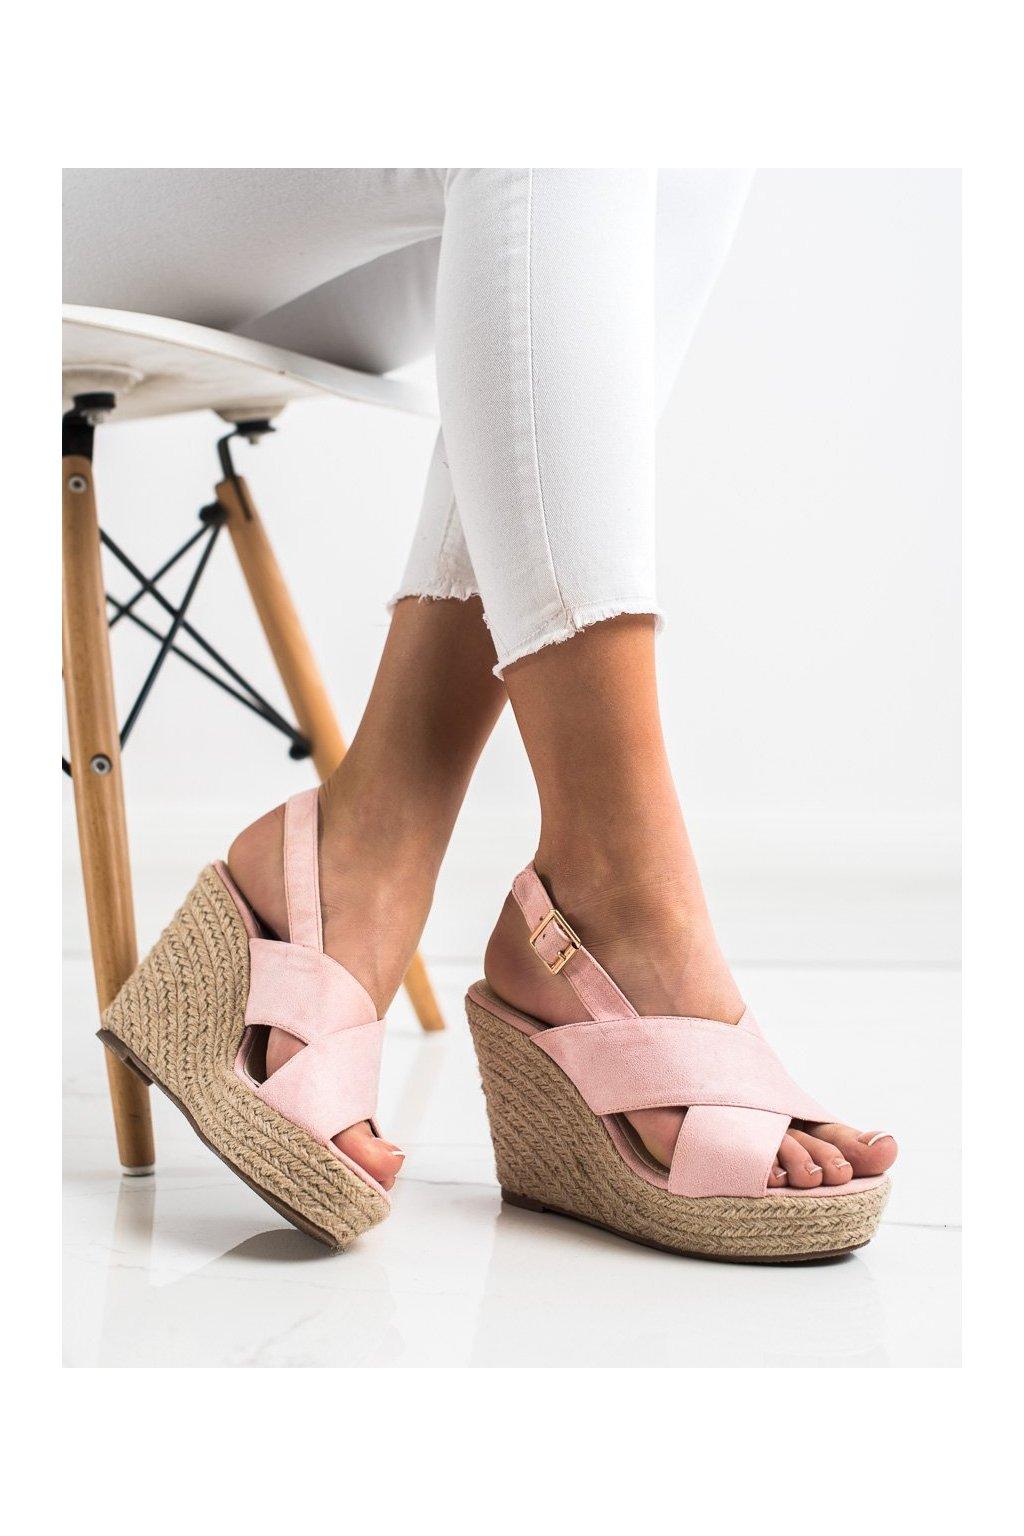 Ružové sandále Sabatina kod DM19-43P